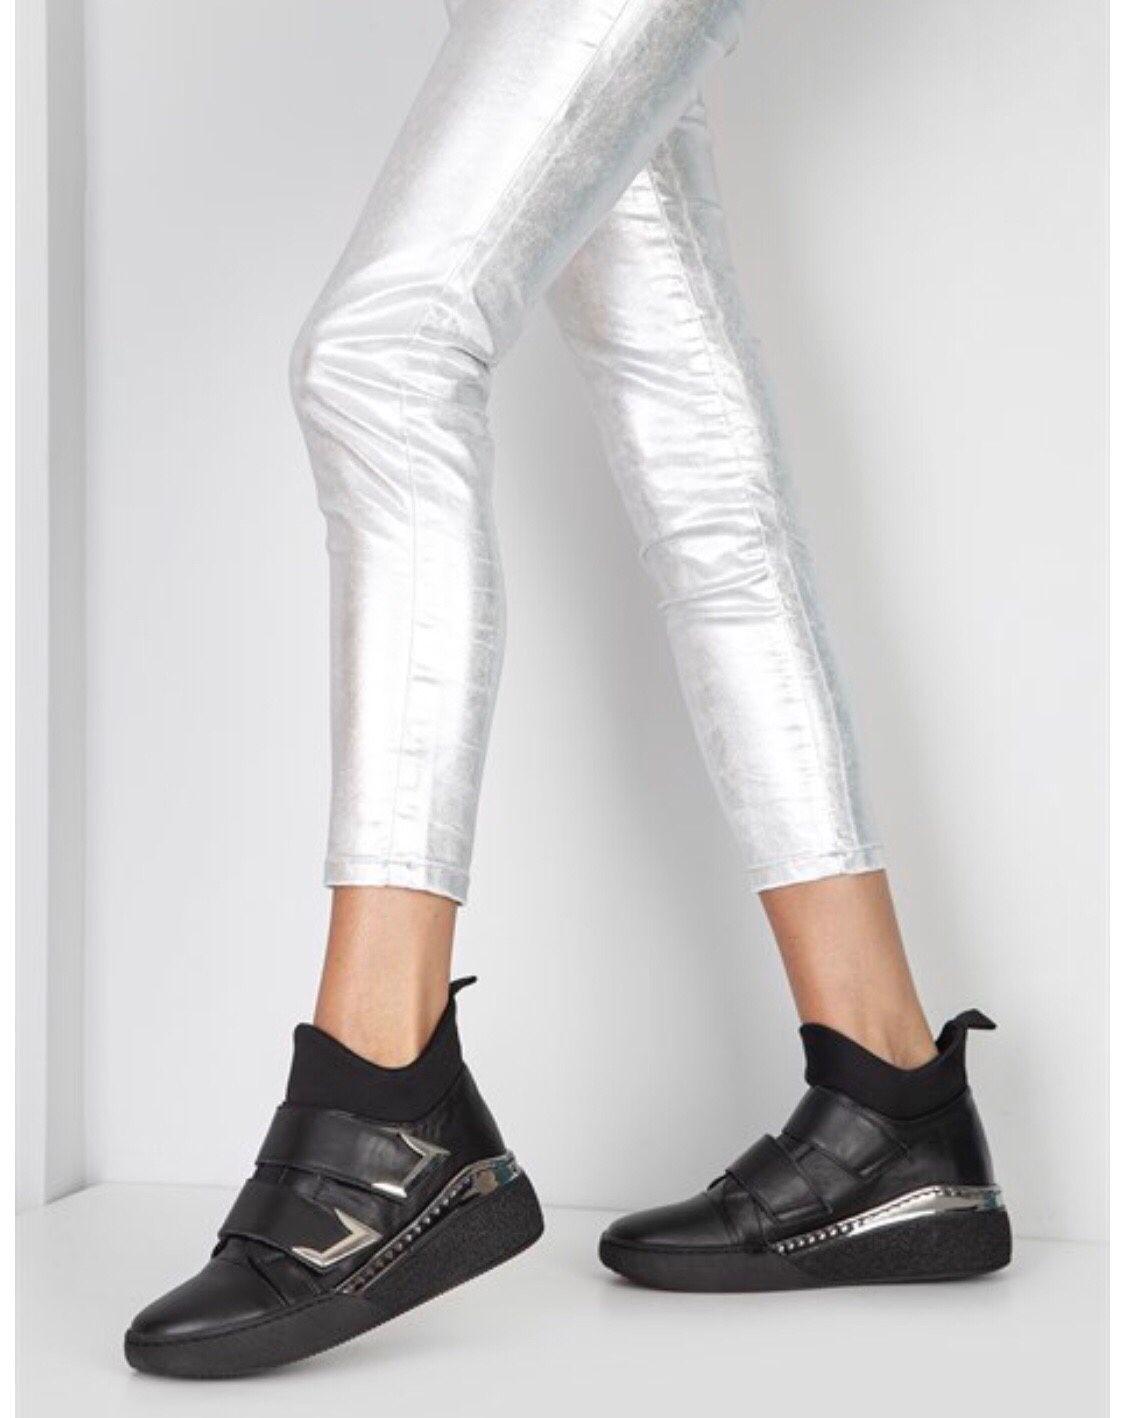 Mao Brand Shoes